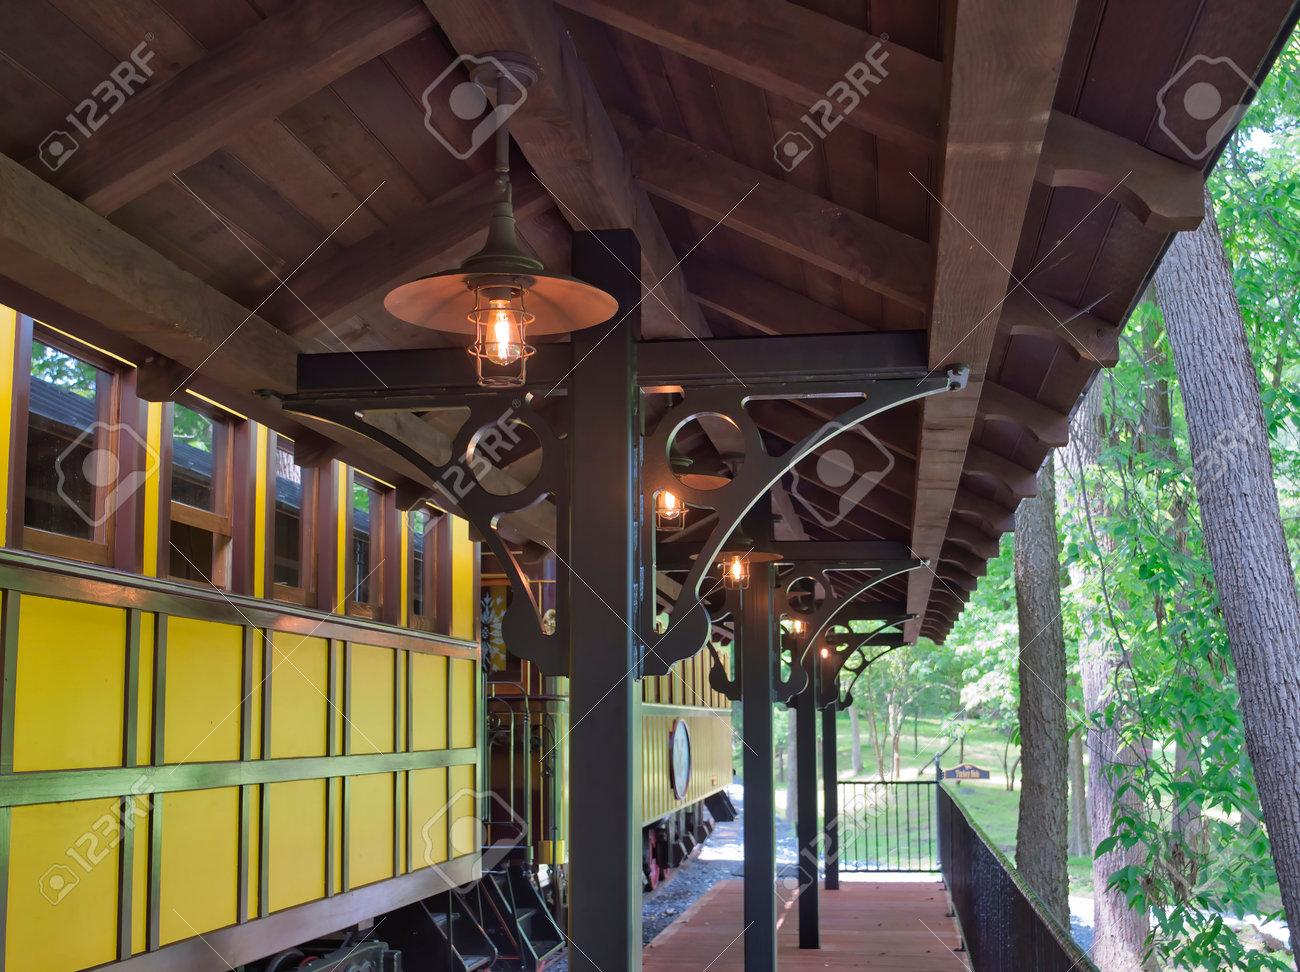 A Train Station Platform with an Antique Passenger Car - 162658704